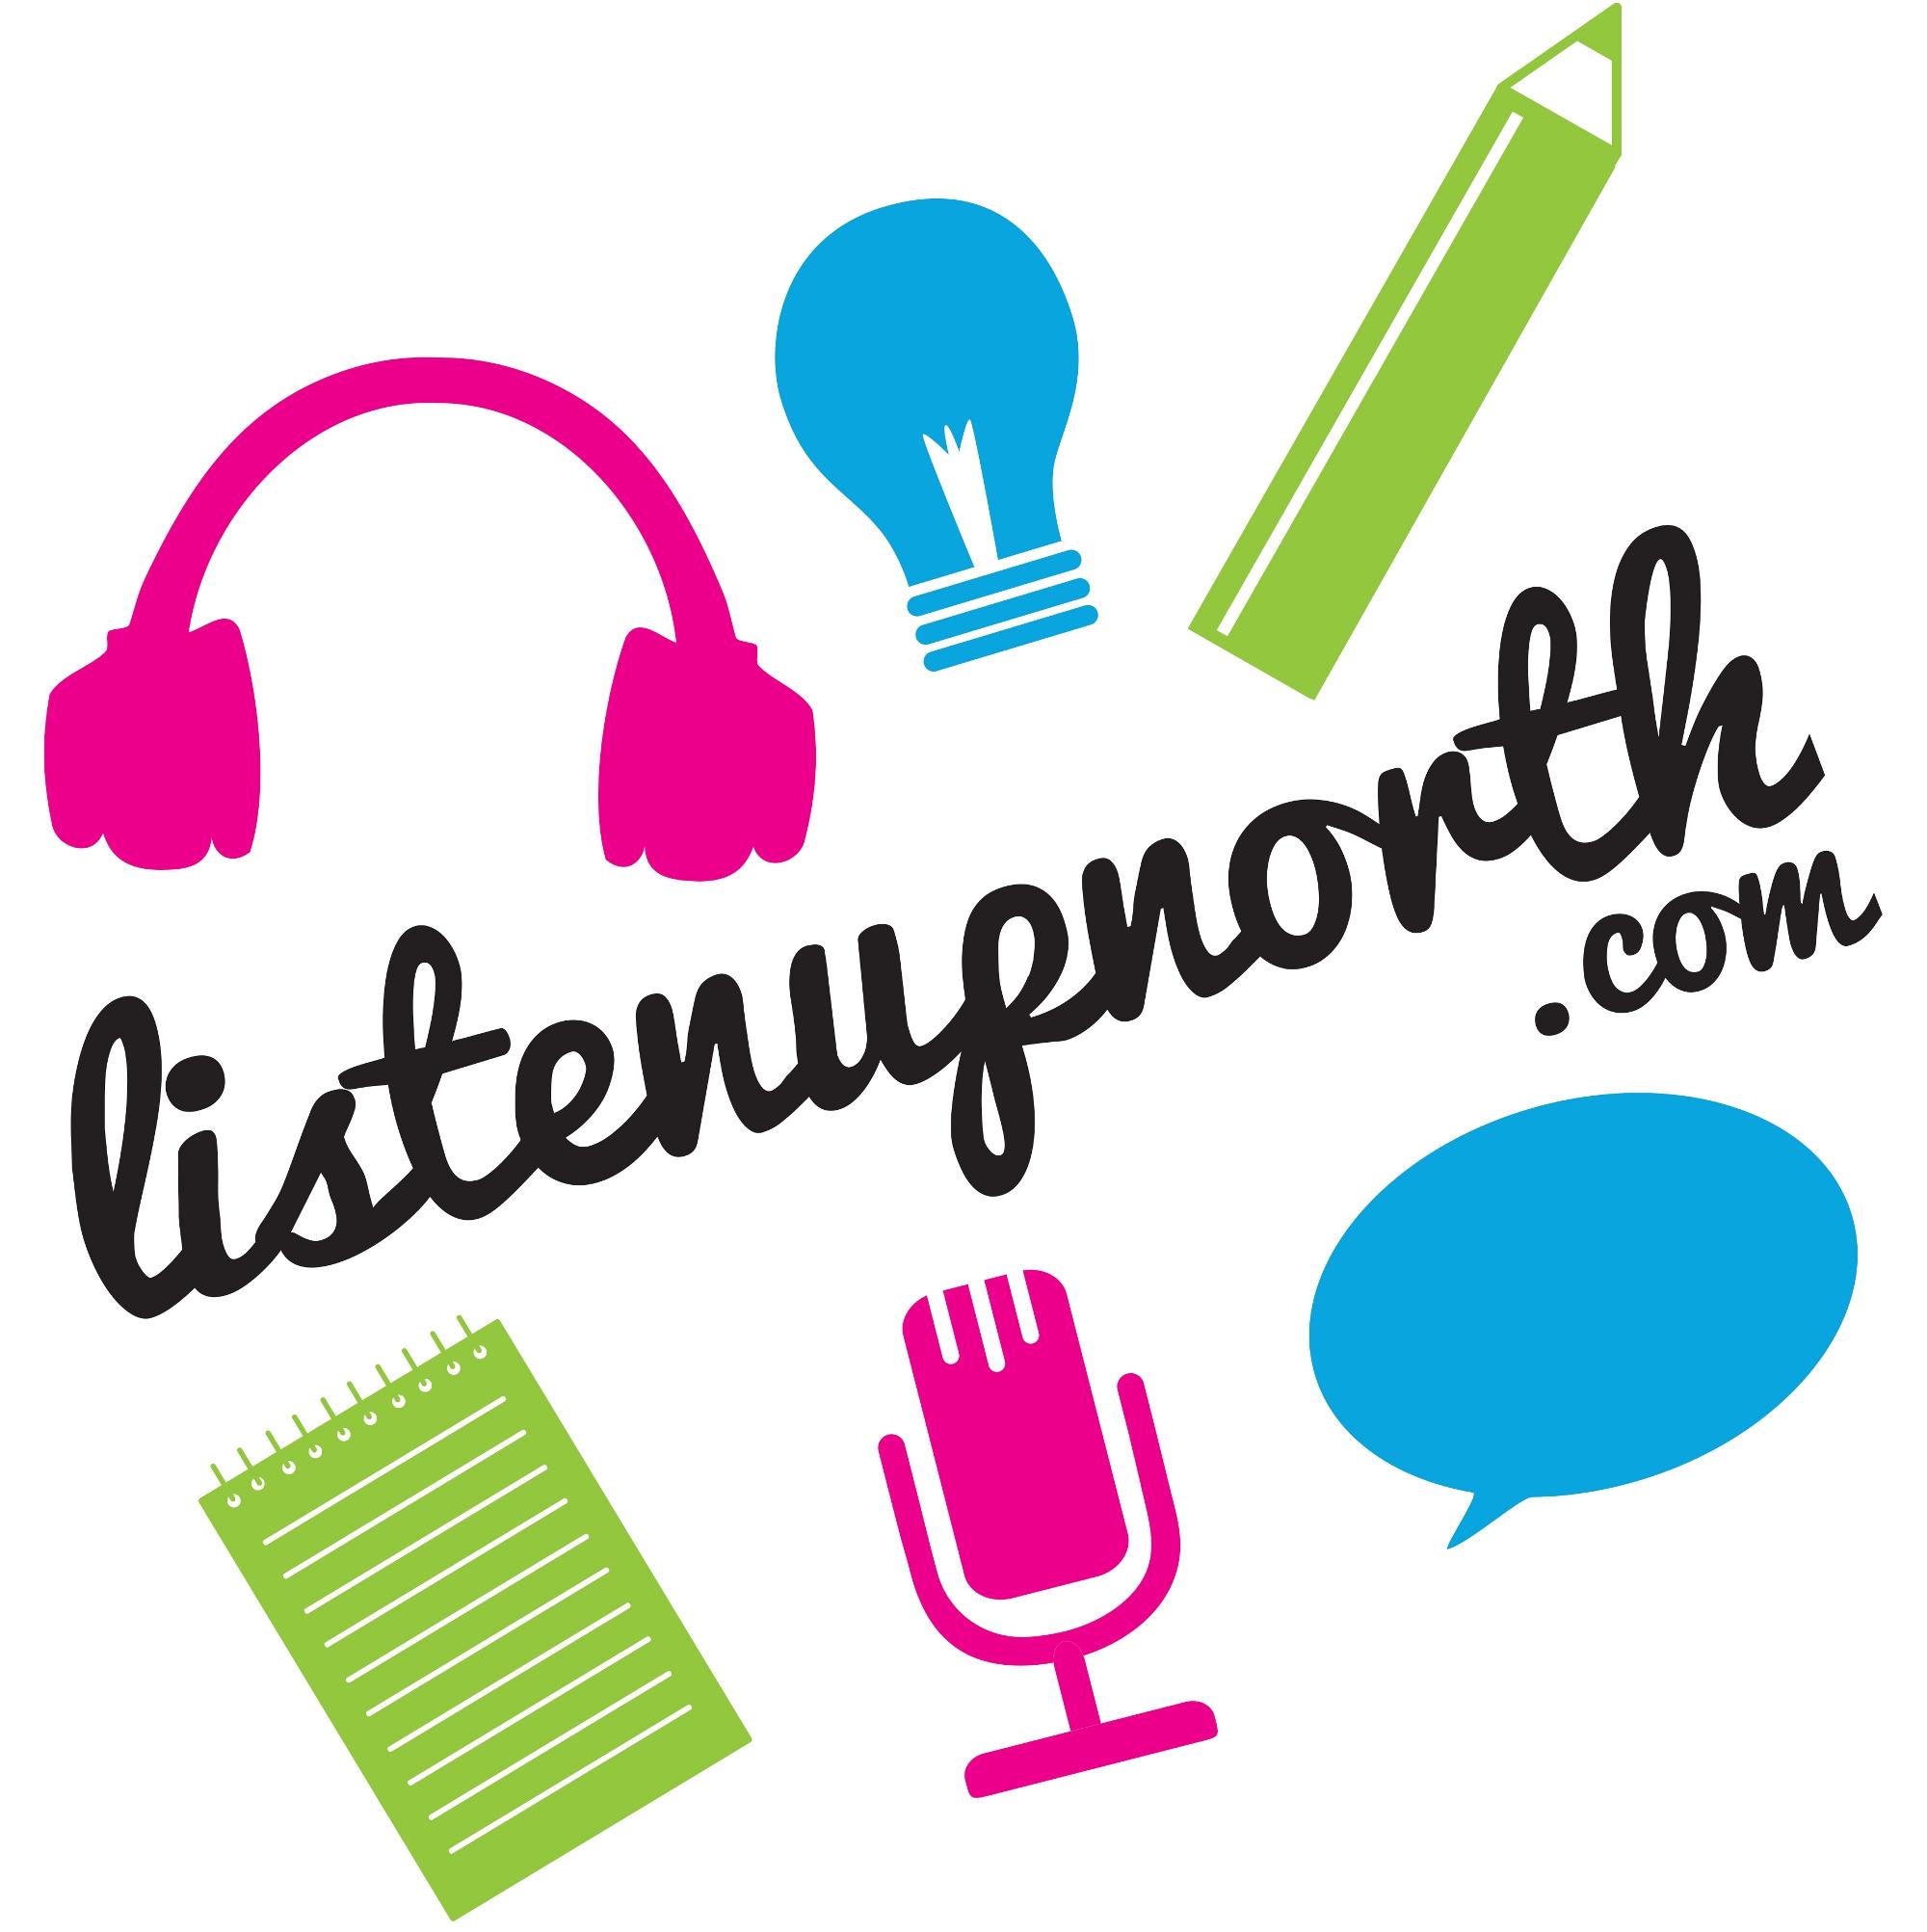 listenupnorth